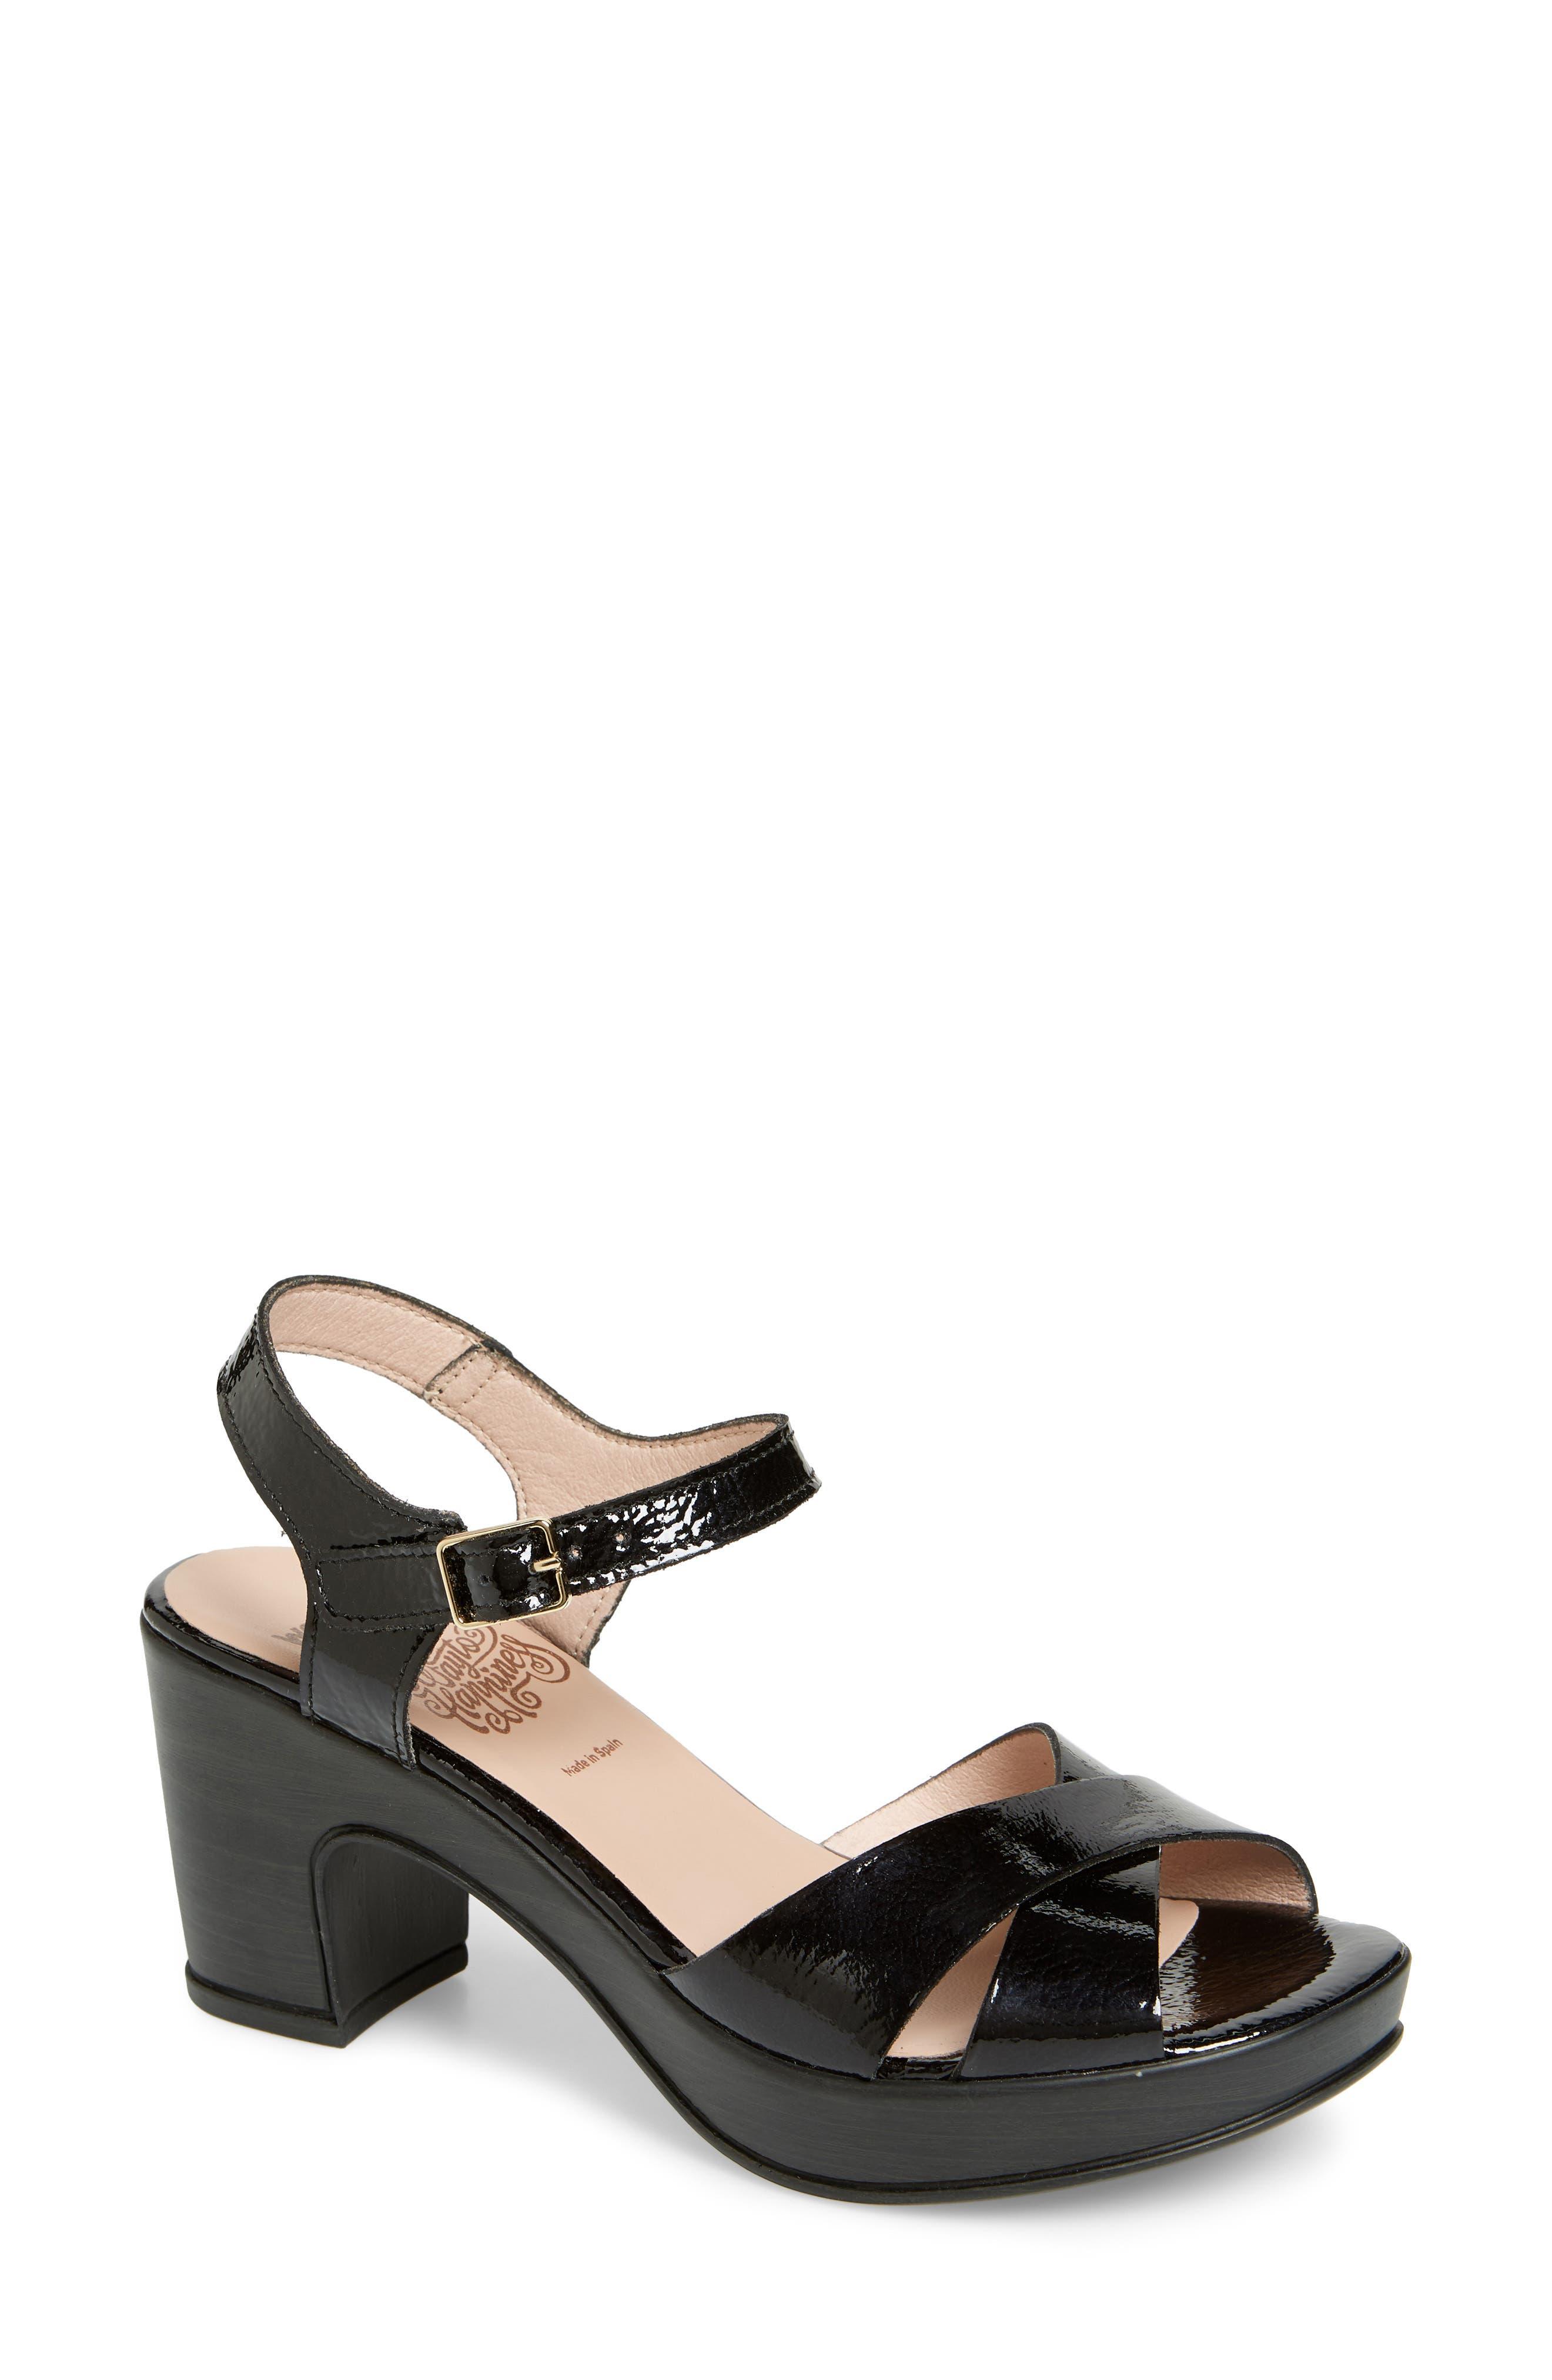 Platform Sandal,                         Main,                         color, Black Patent Leather